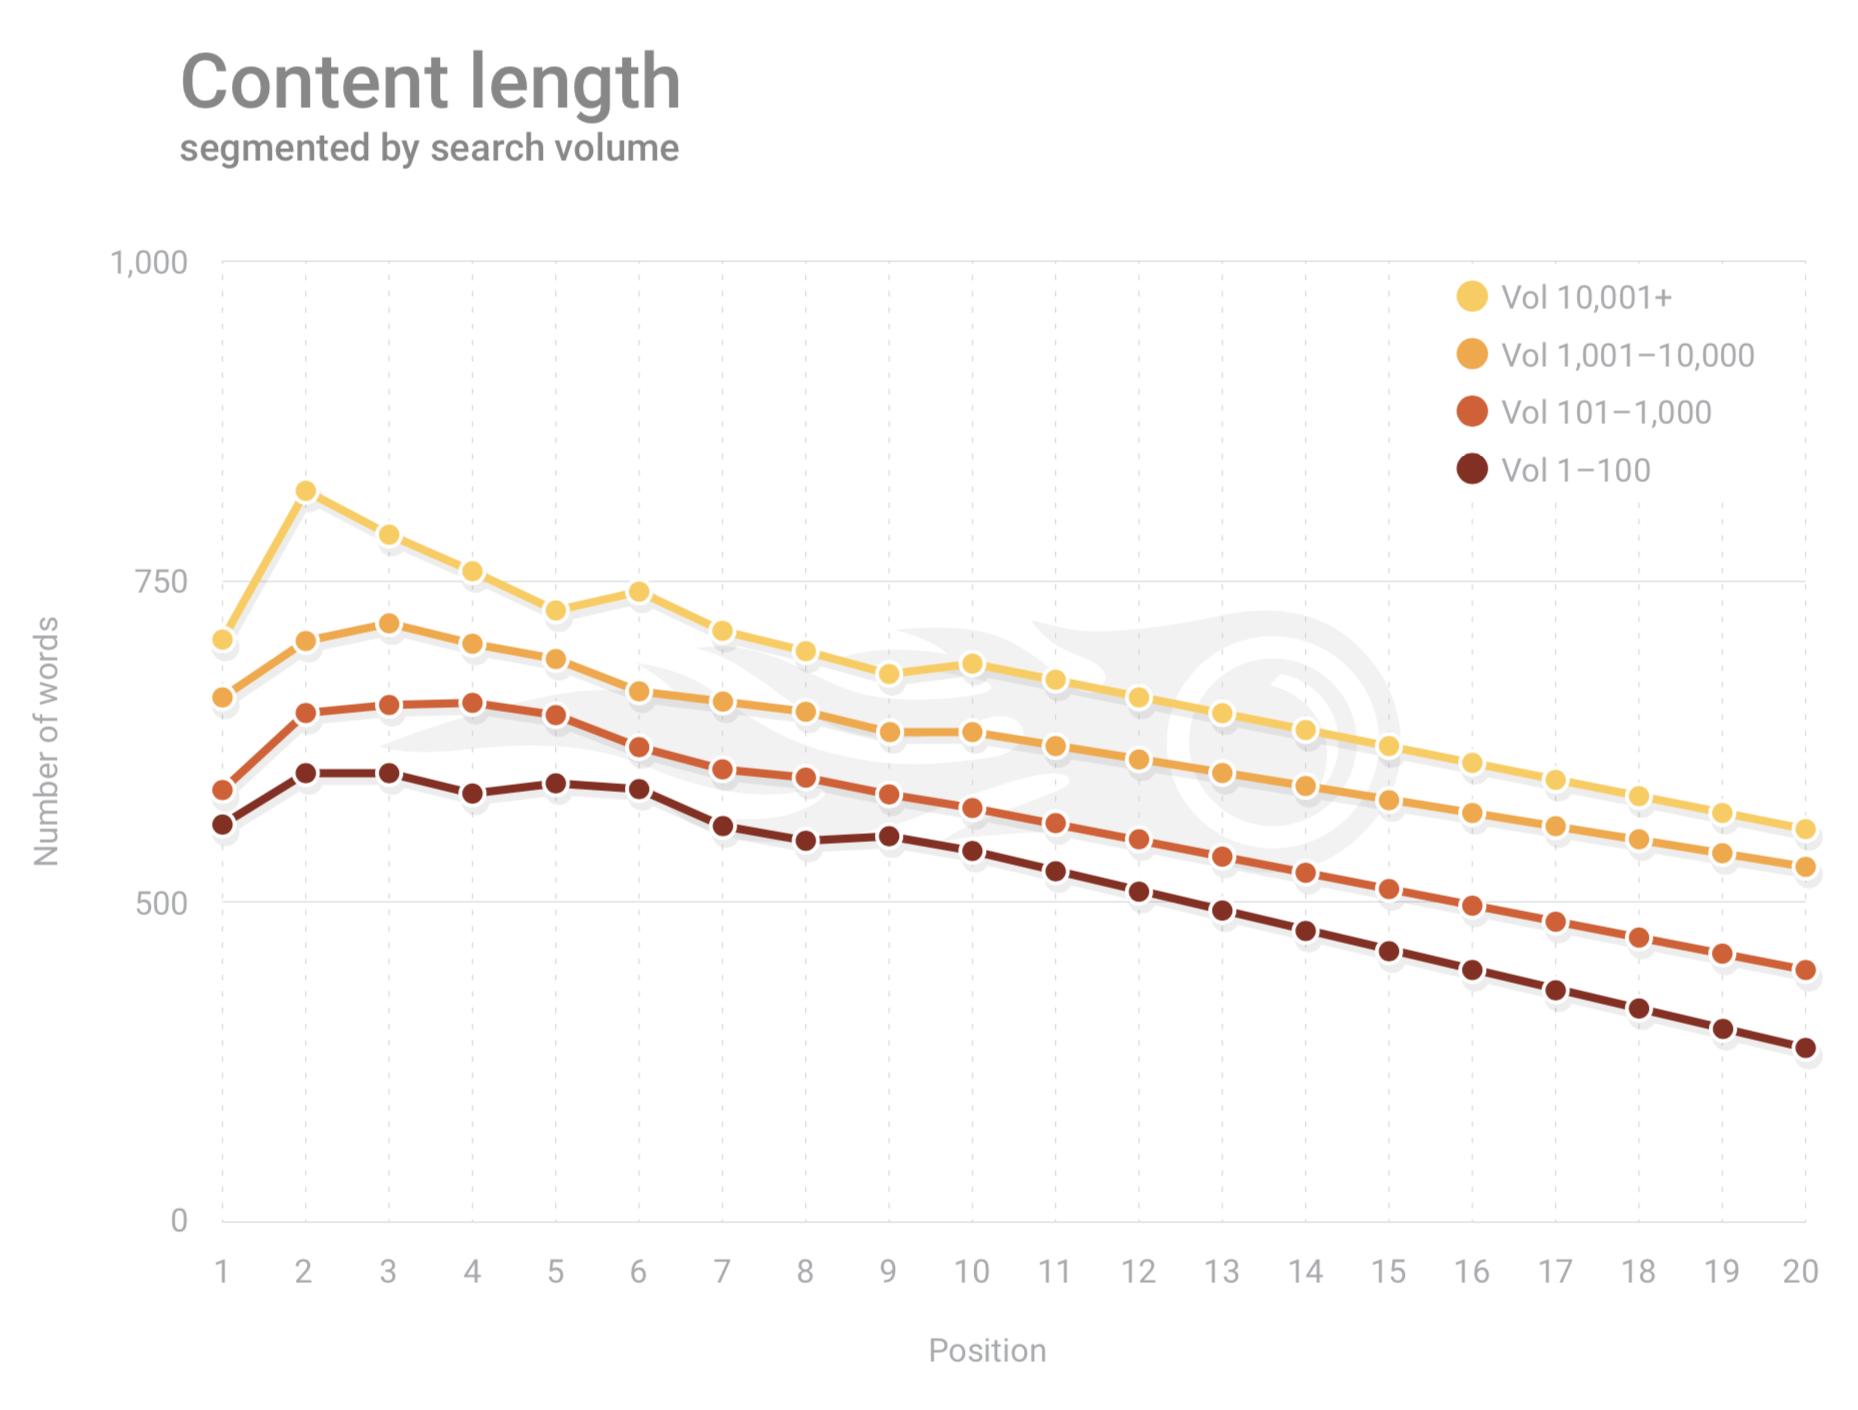 SEMRush Google Content Length 2019